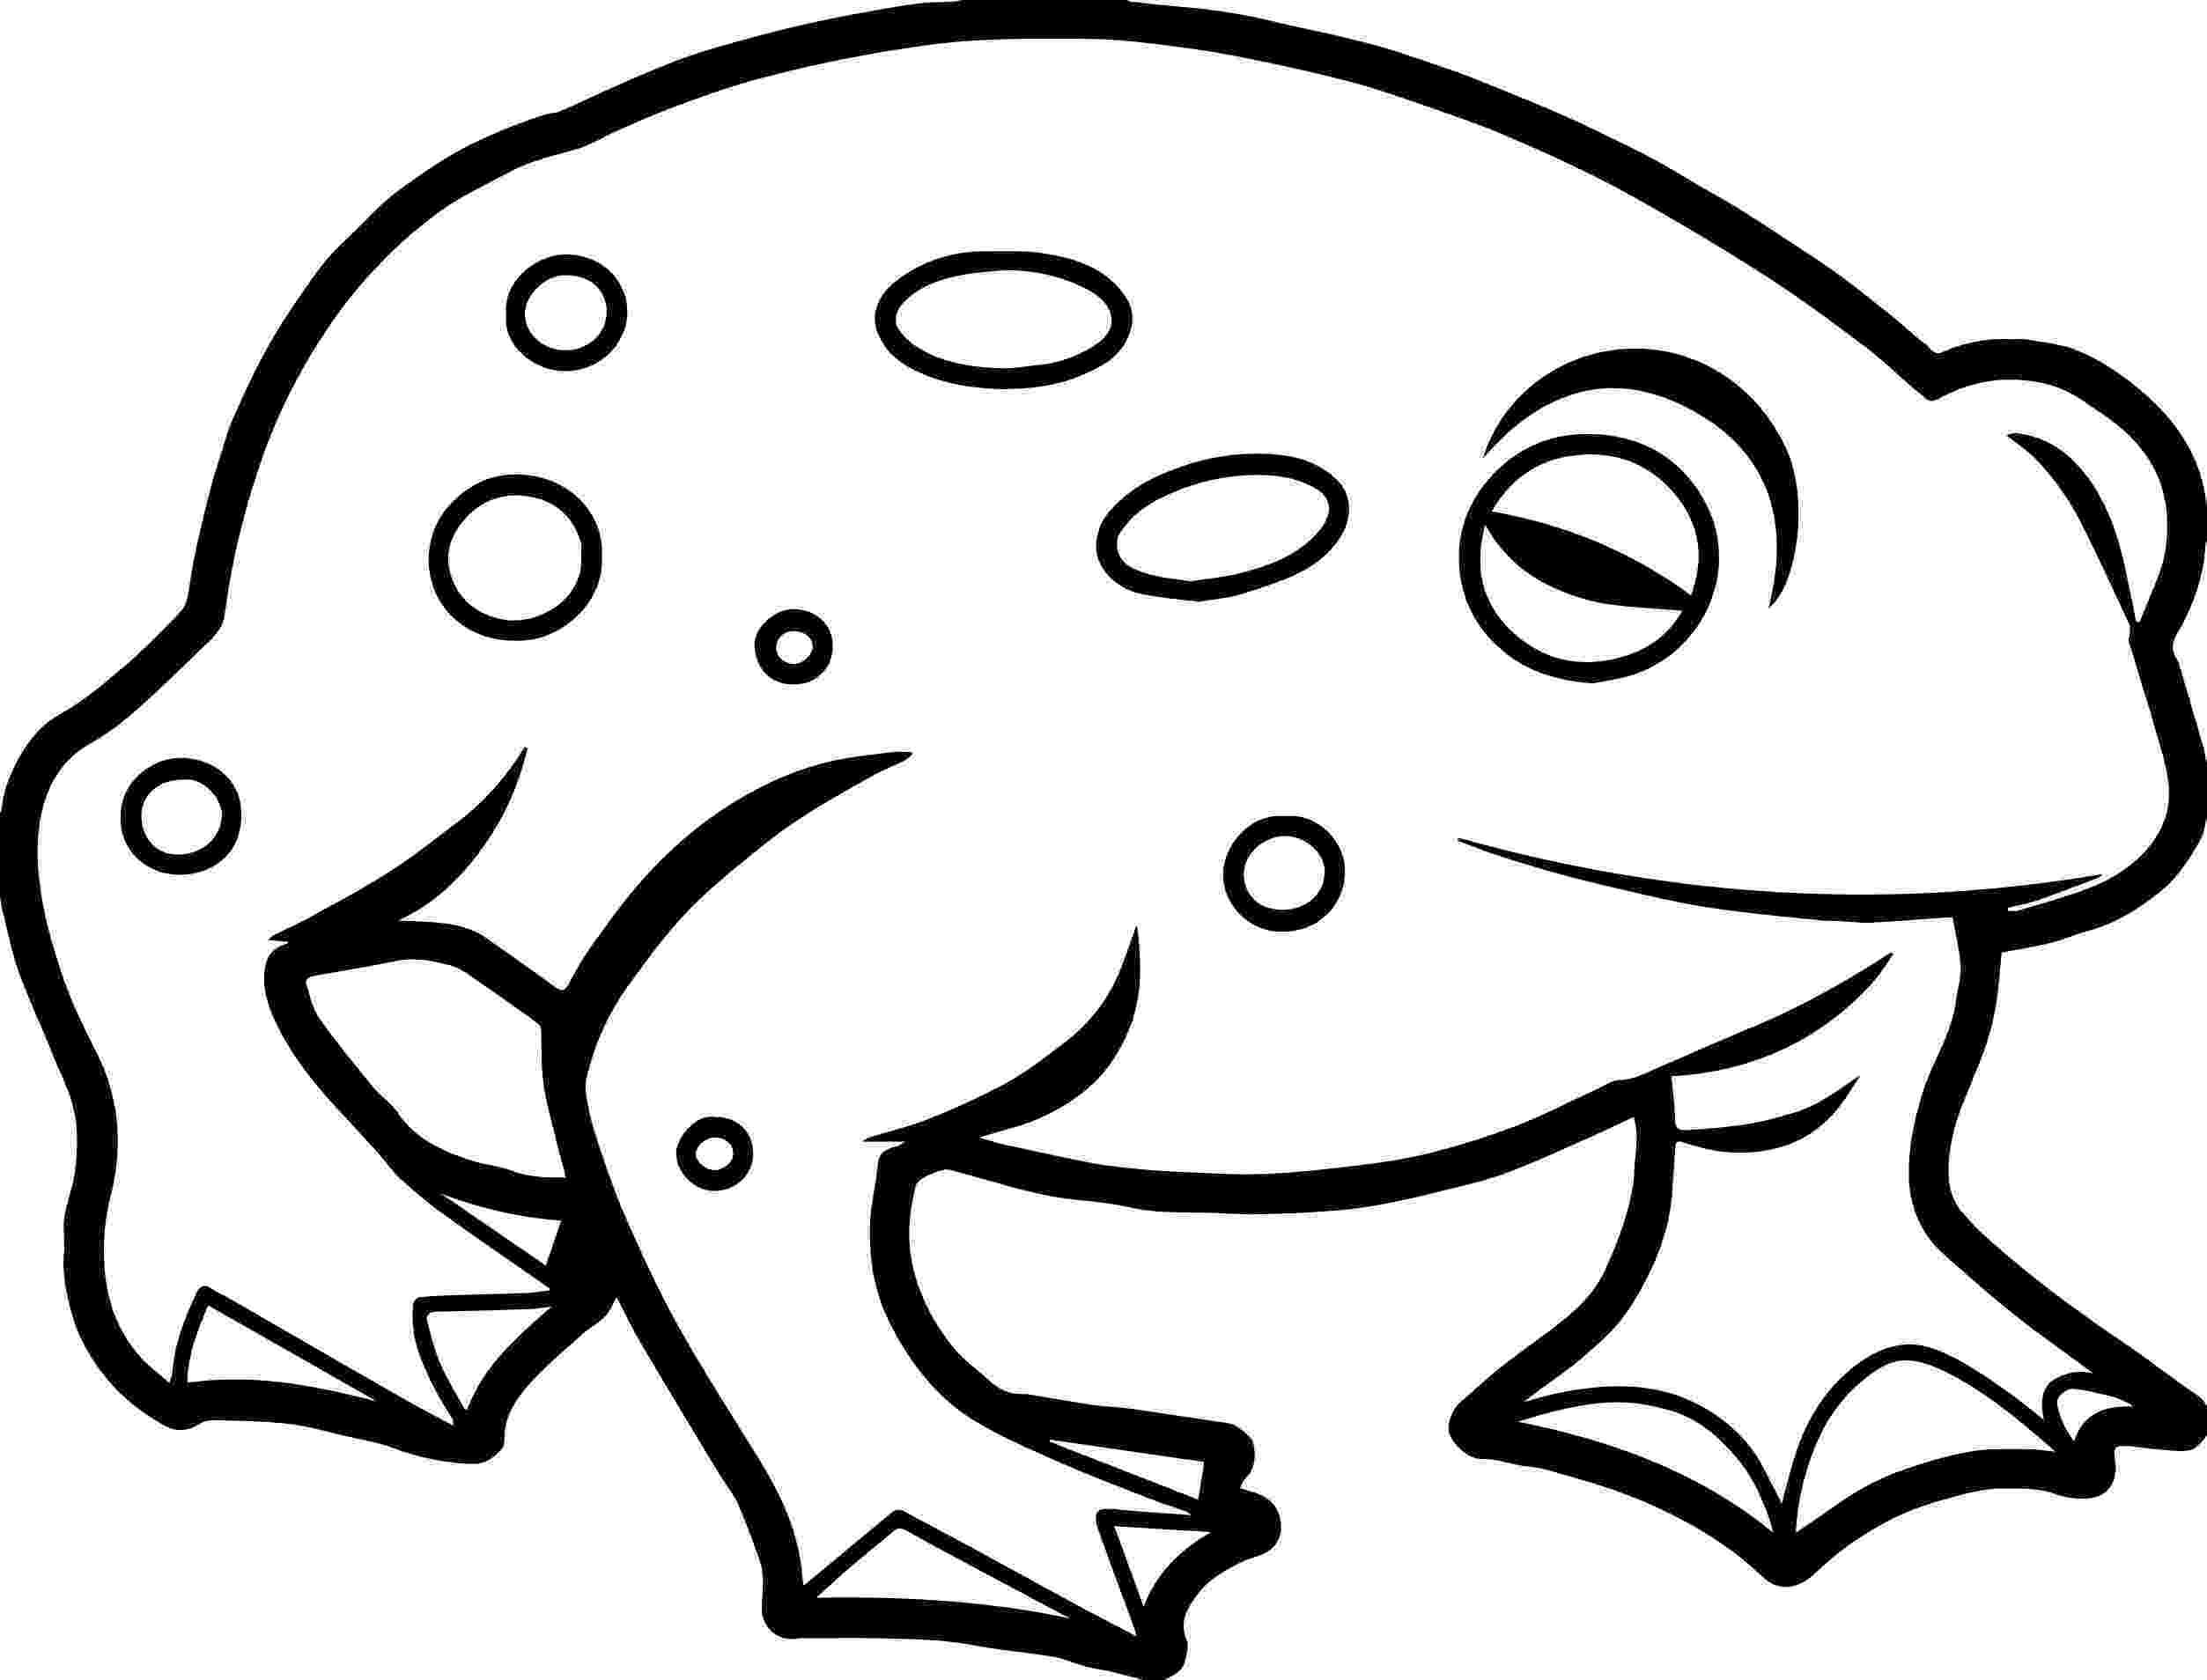 amphibian coloring pages amphibian waiting frog coloring page wecoloringpagecom coloring pages amphibian